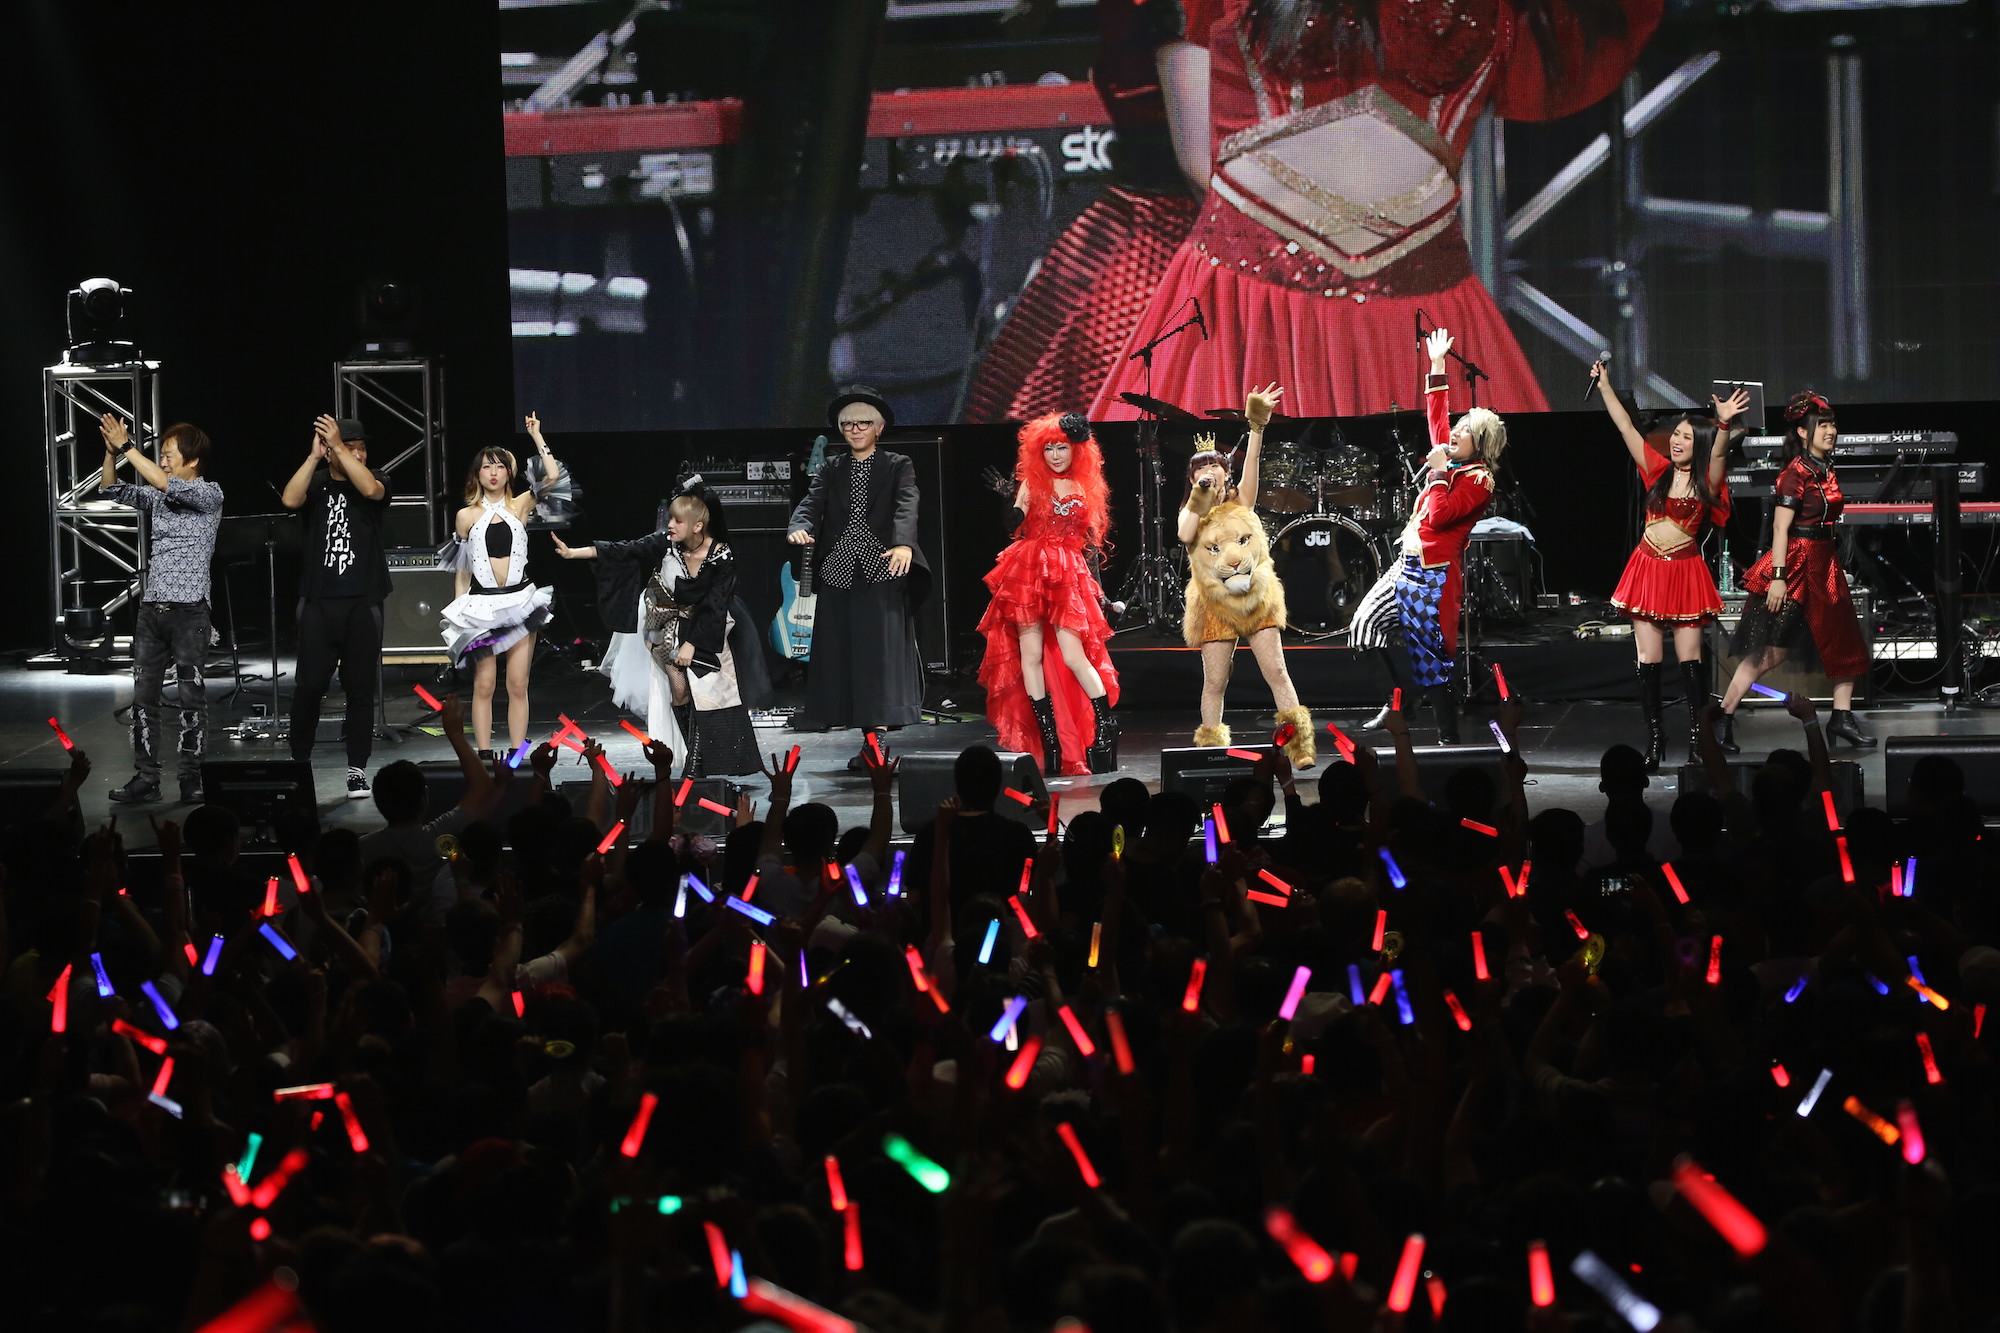 RMMS-AWMAX17-All-Japan-Super-Live-2017-07-01-4690